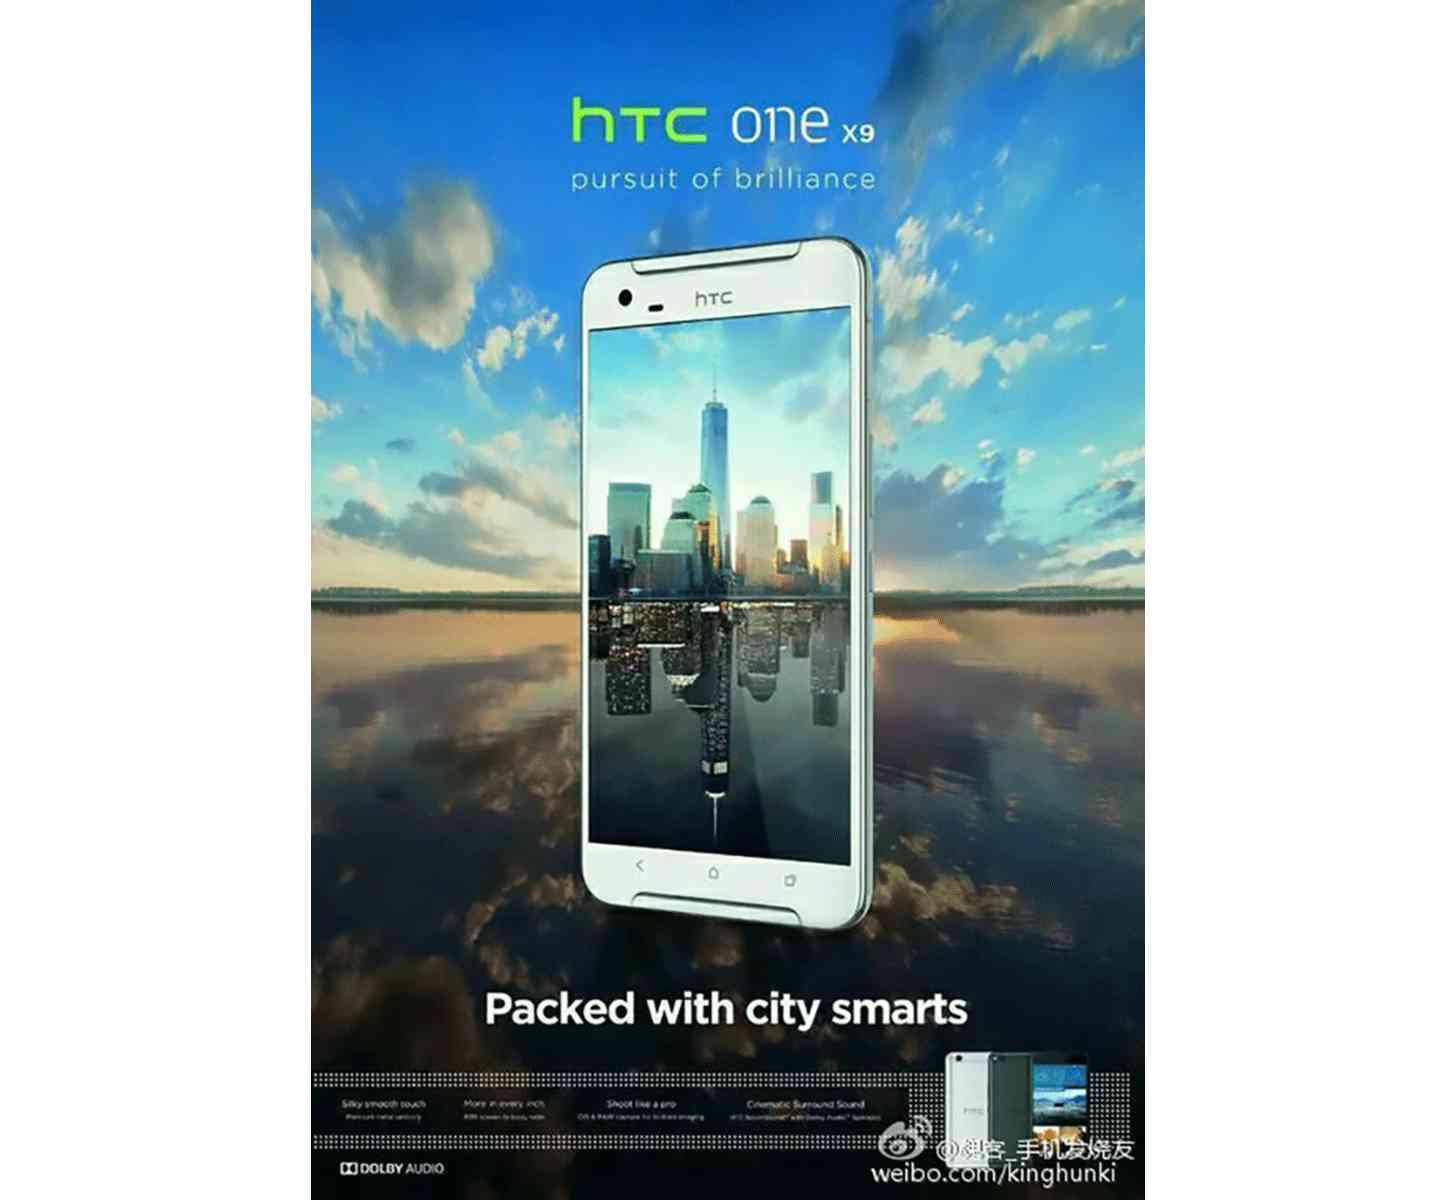 HTC One X9 image leak